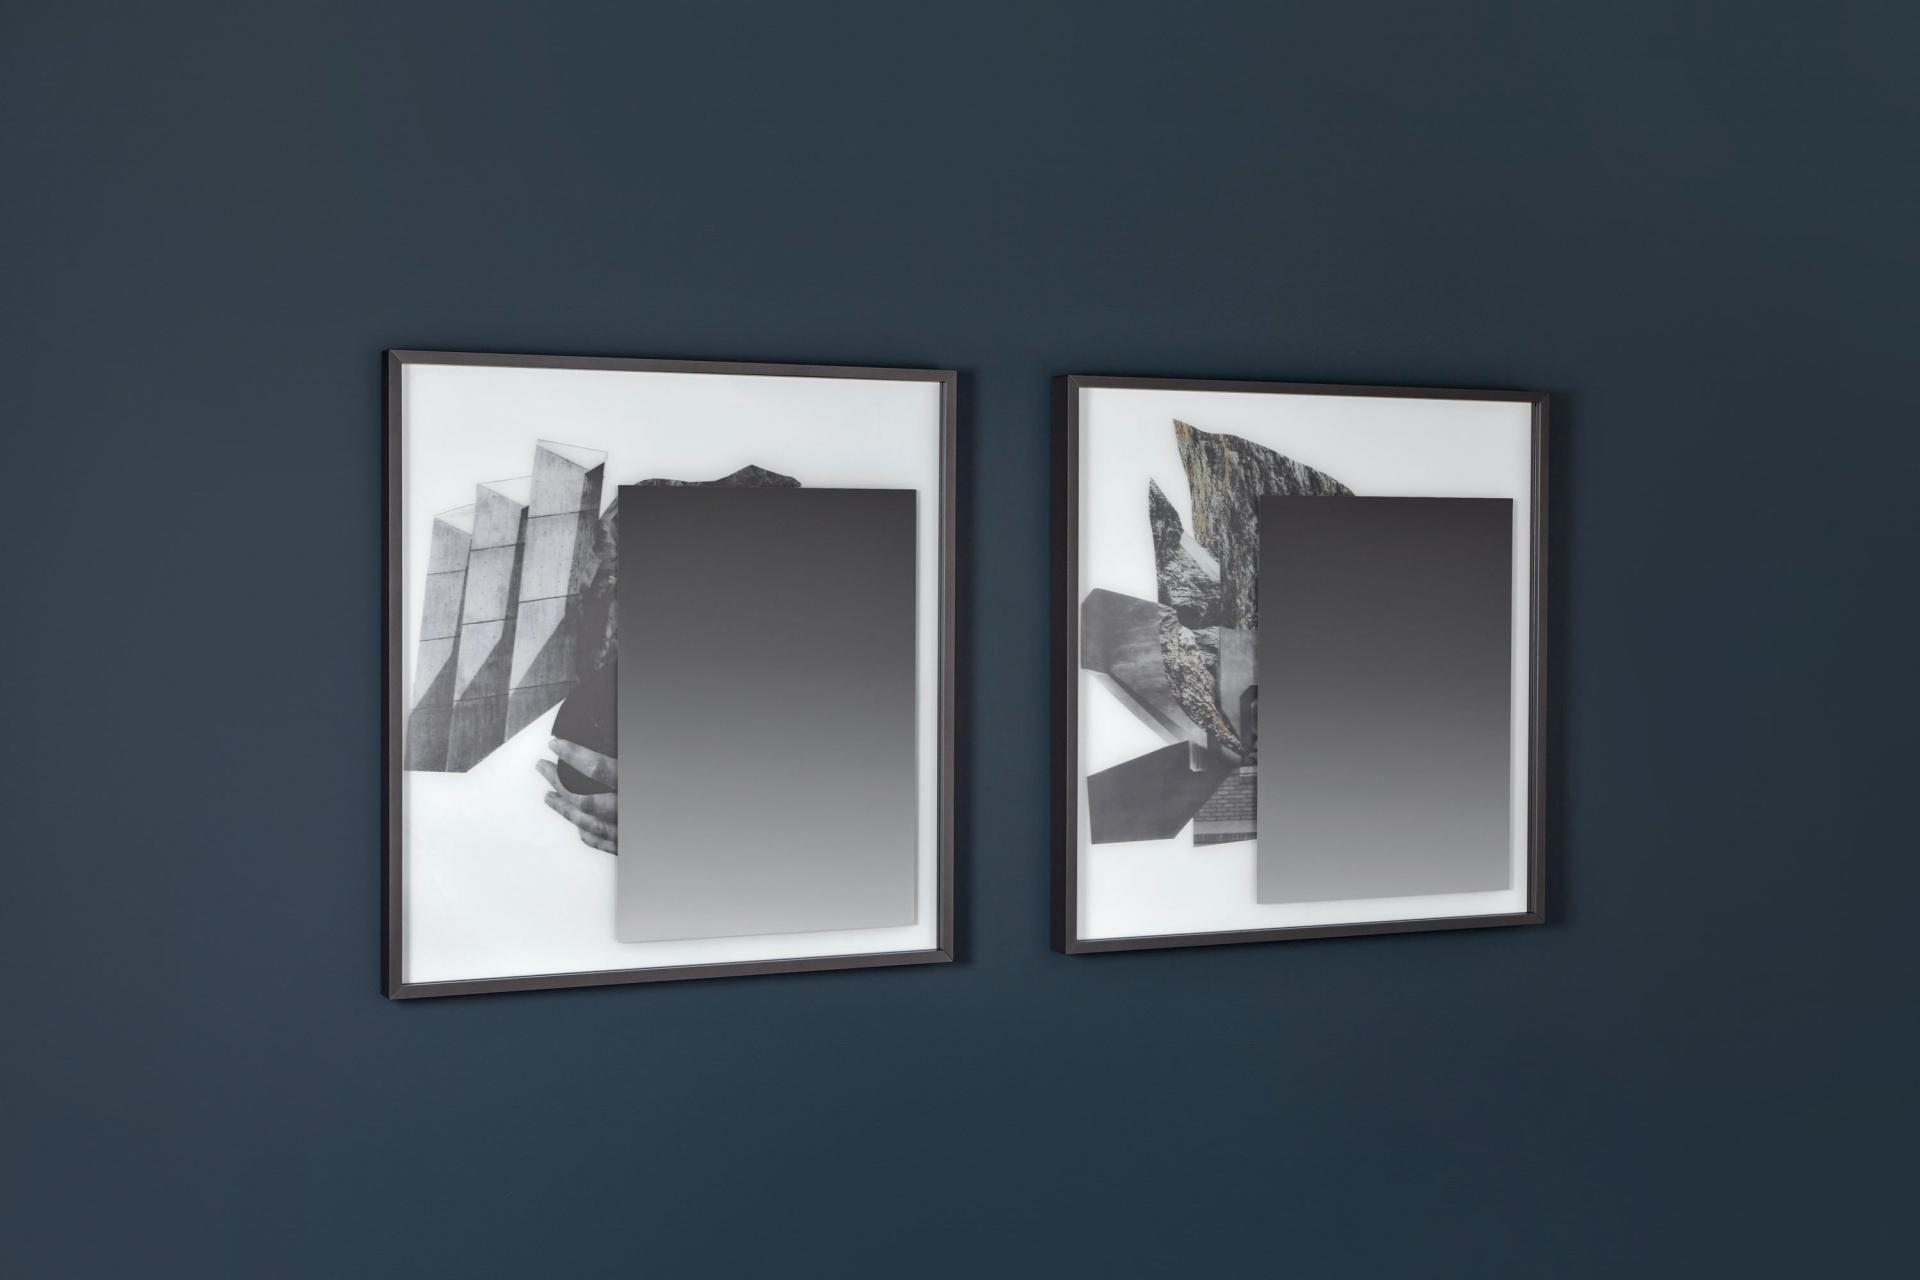 studio-forma-96_antonio-lupi-collage2